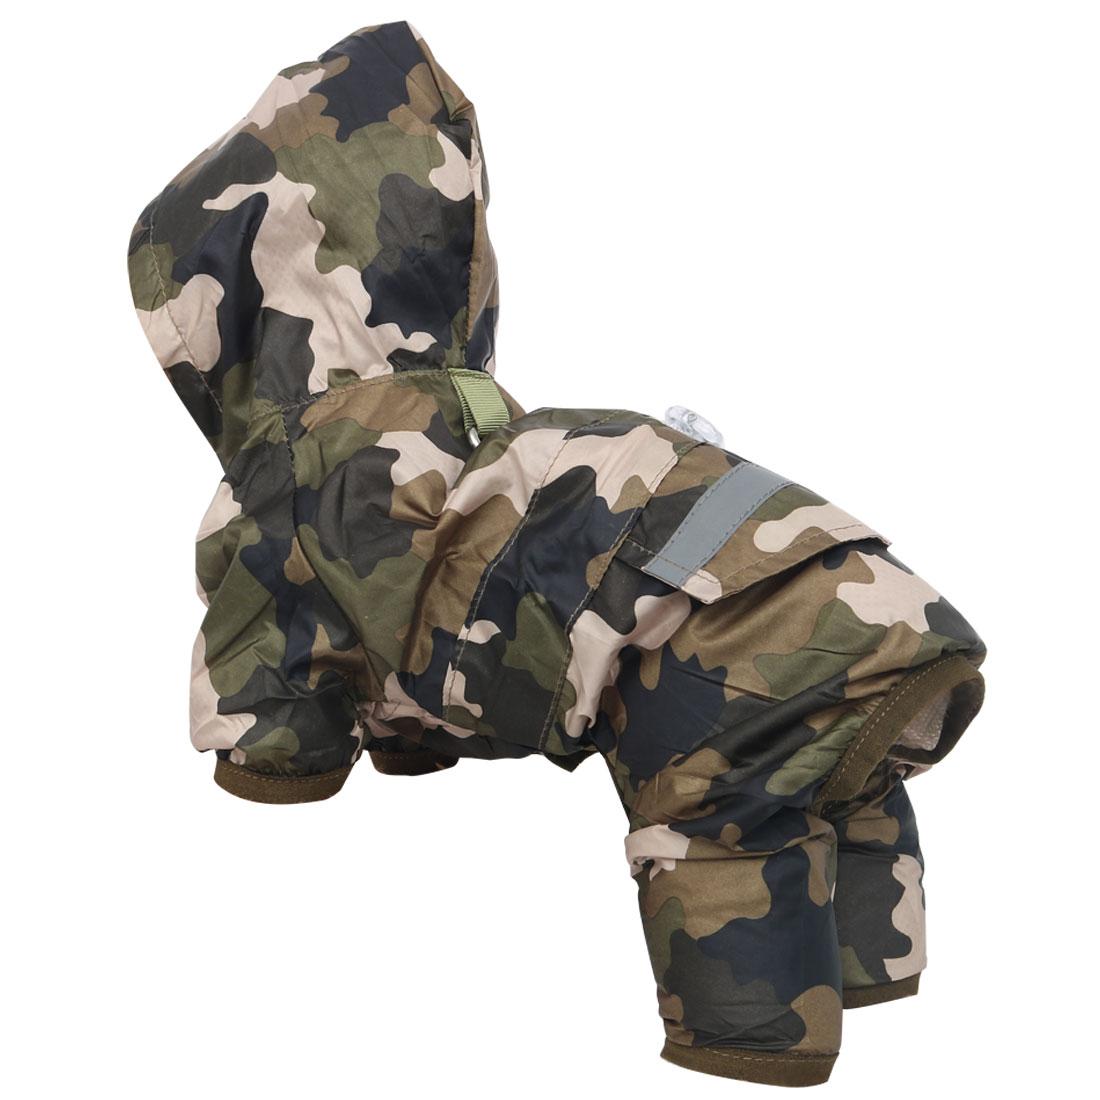 Pet Dog Raincoat Jacket Clothes Polyester Water-resistant Rainwear Camo Color L